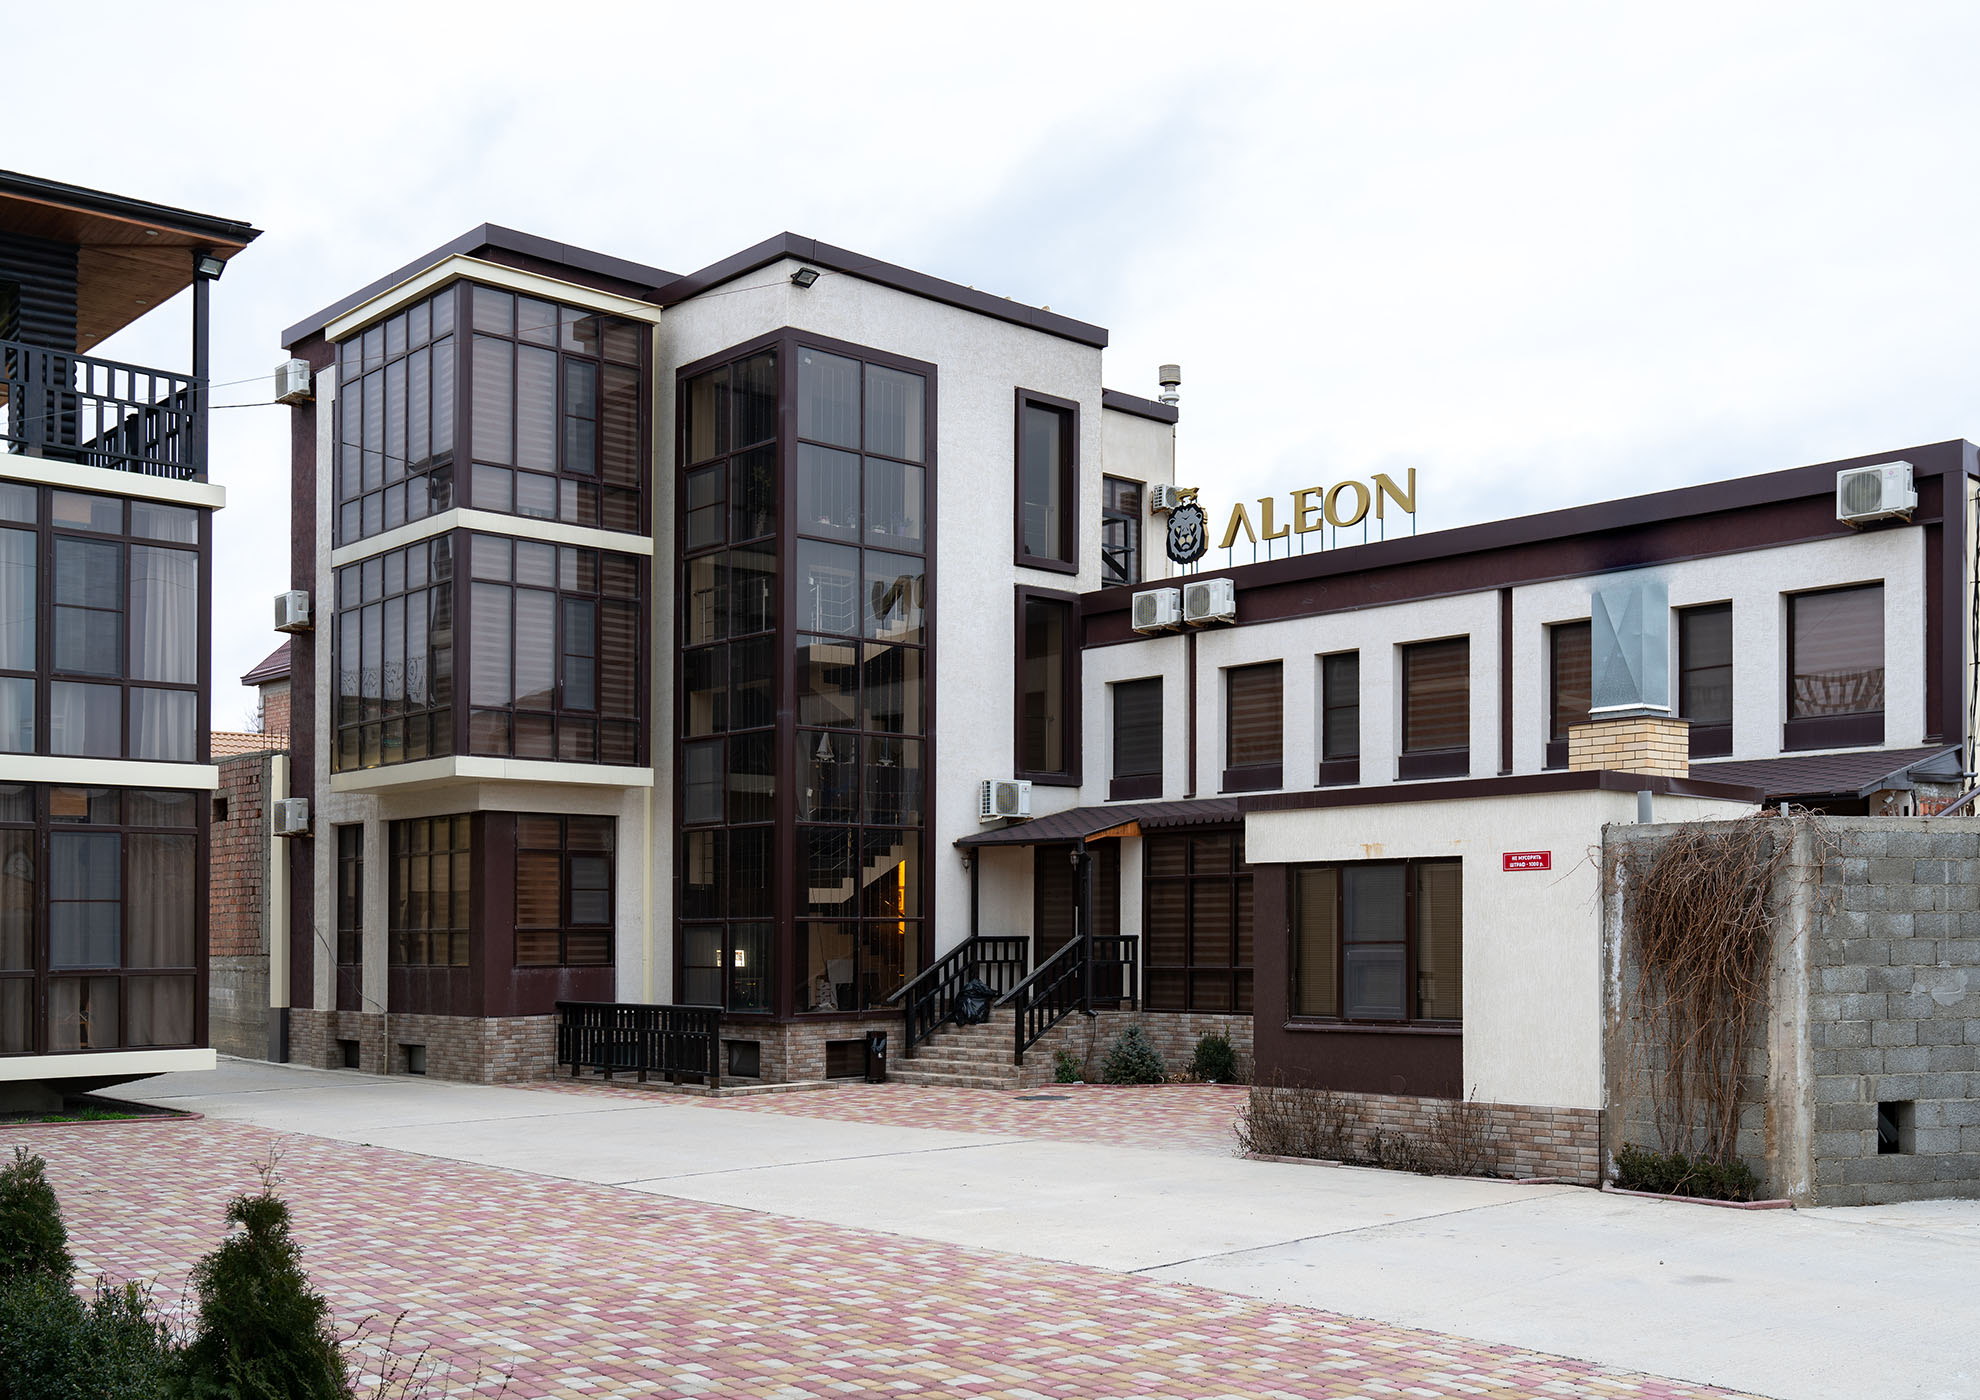 Aleon Hotel Makhachkala